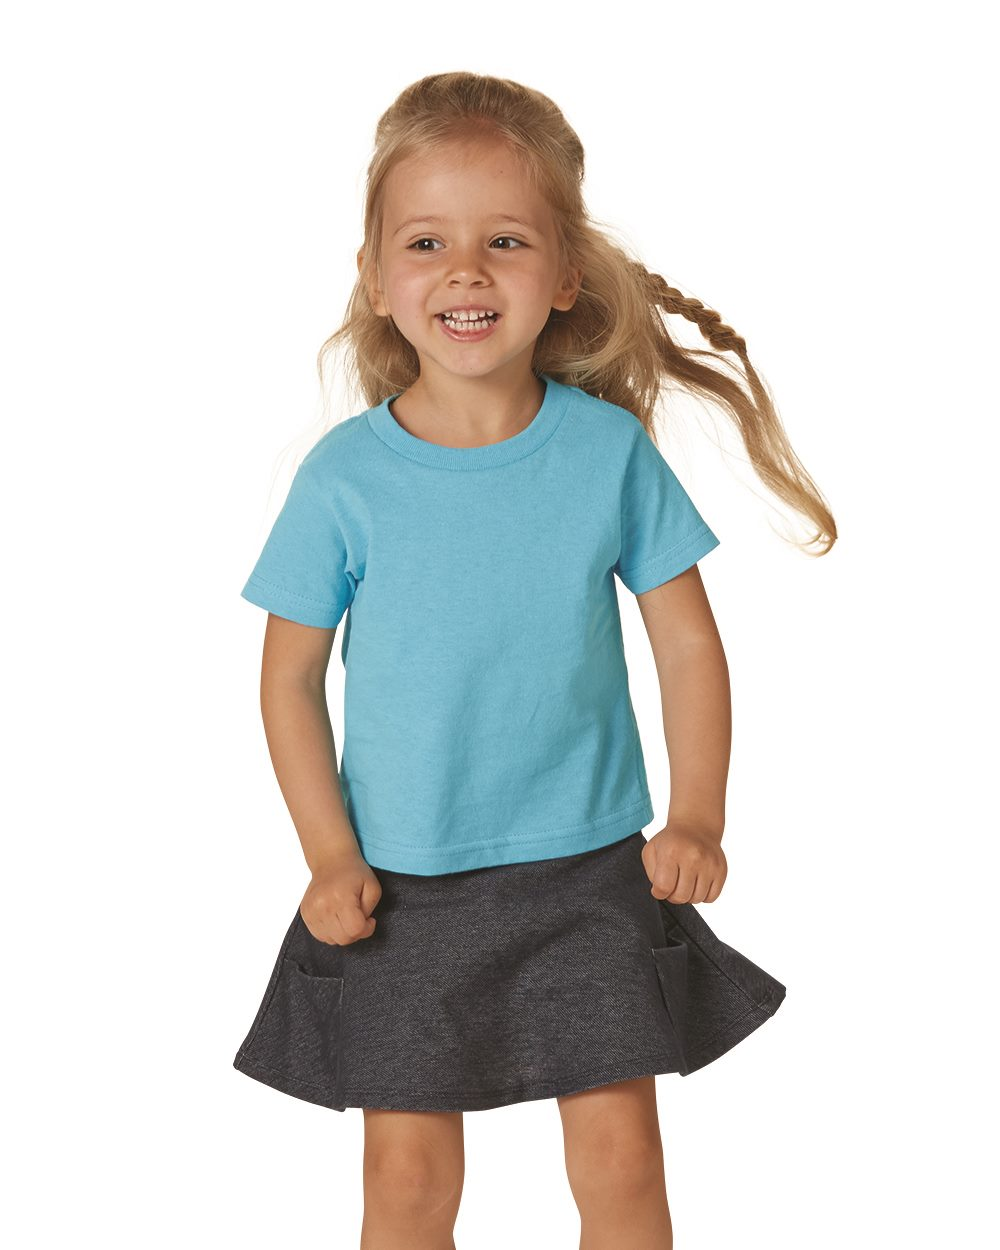 Rabbit Skins RS3301 婴幼儿宝宝短袖T恤